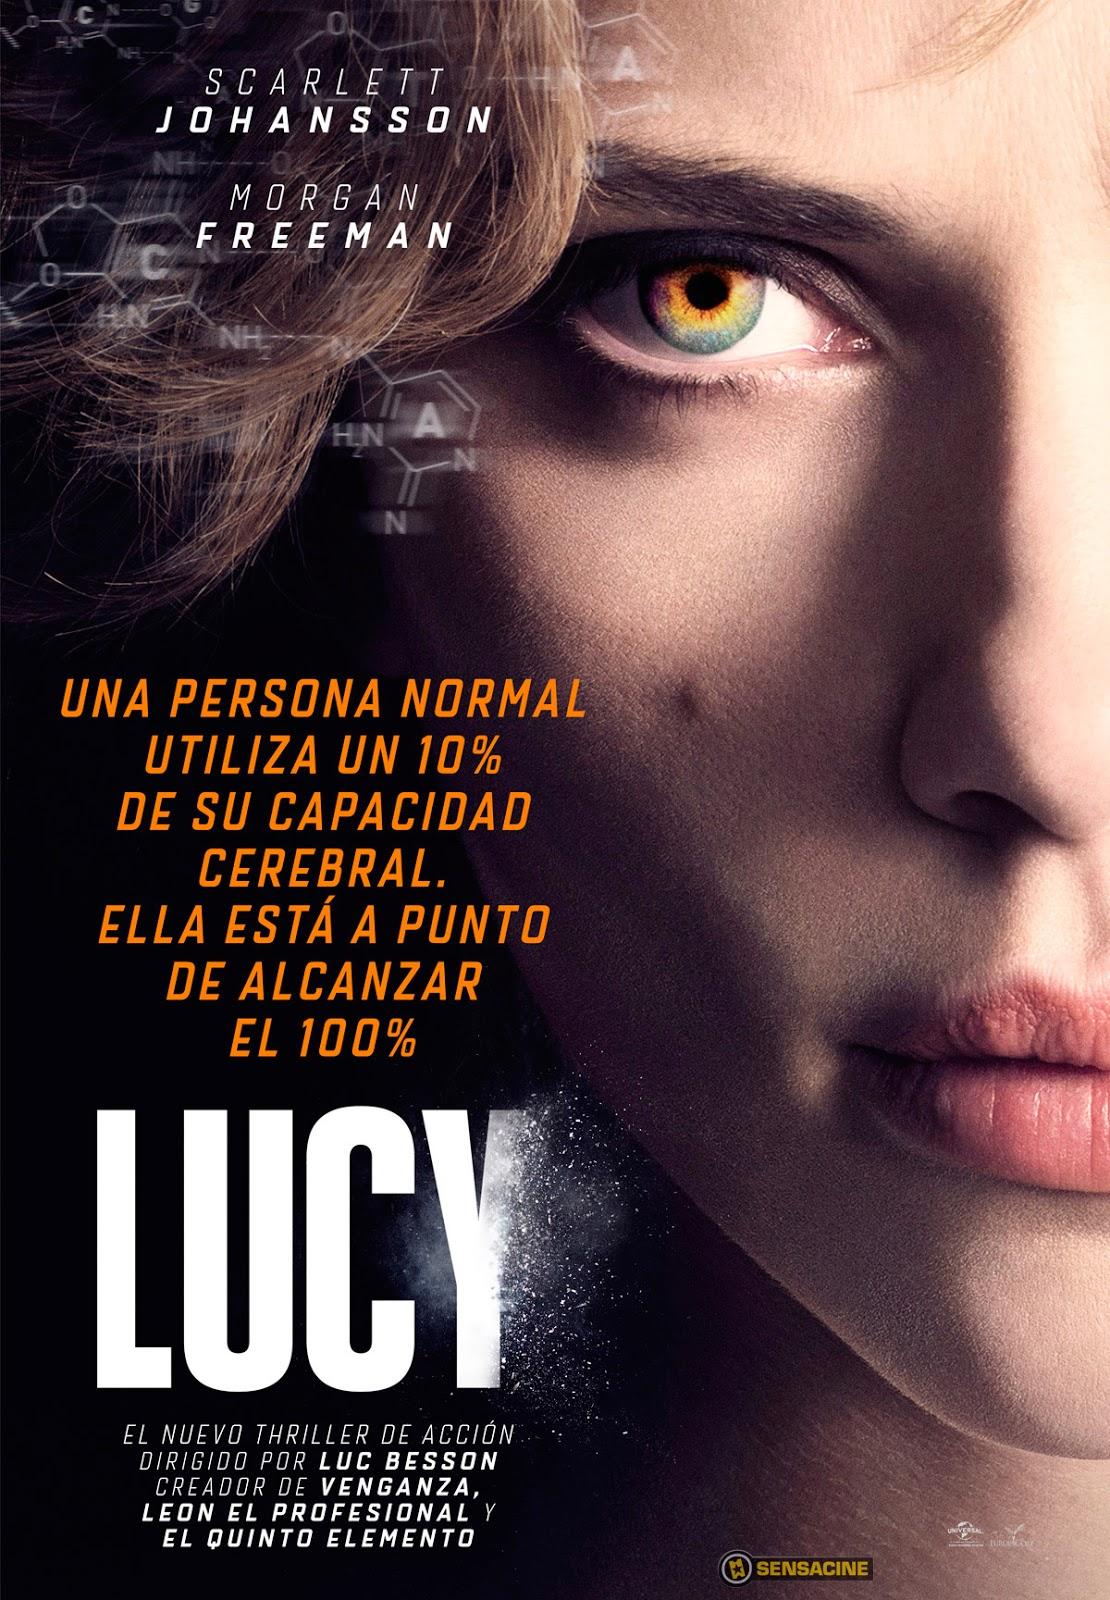 Lucy (2014) Ver gratis online en vivo streaming sin descarga ni torrent